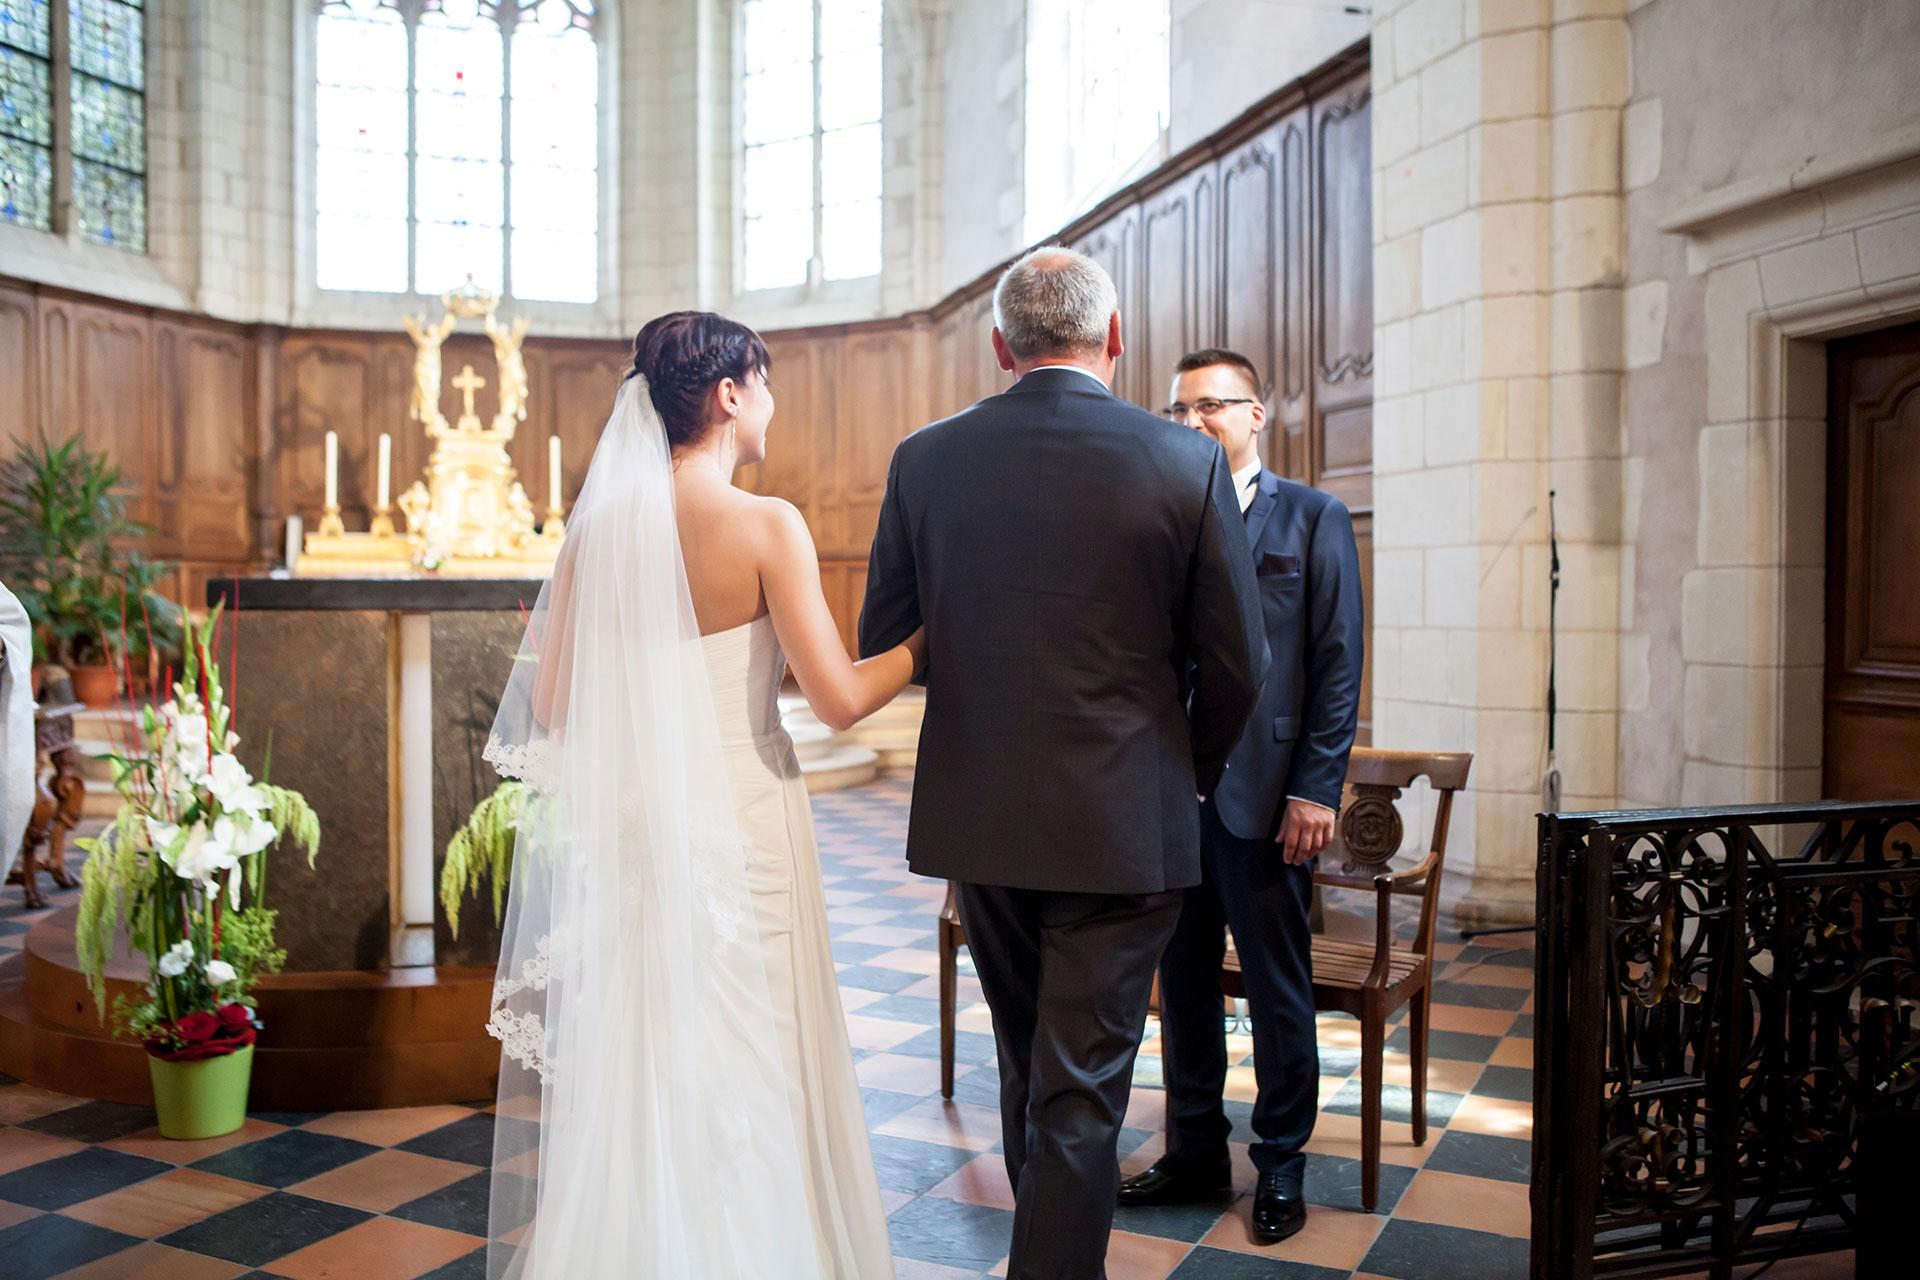 particuliers-evenements-mariages-oui-aurelie&geoffrey-10